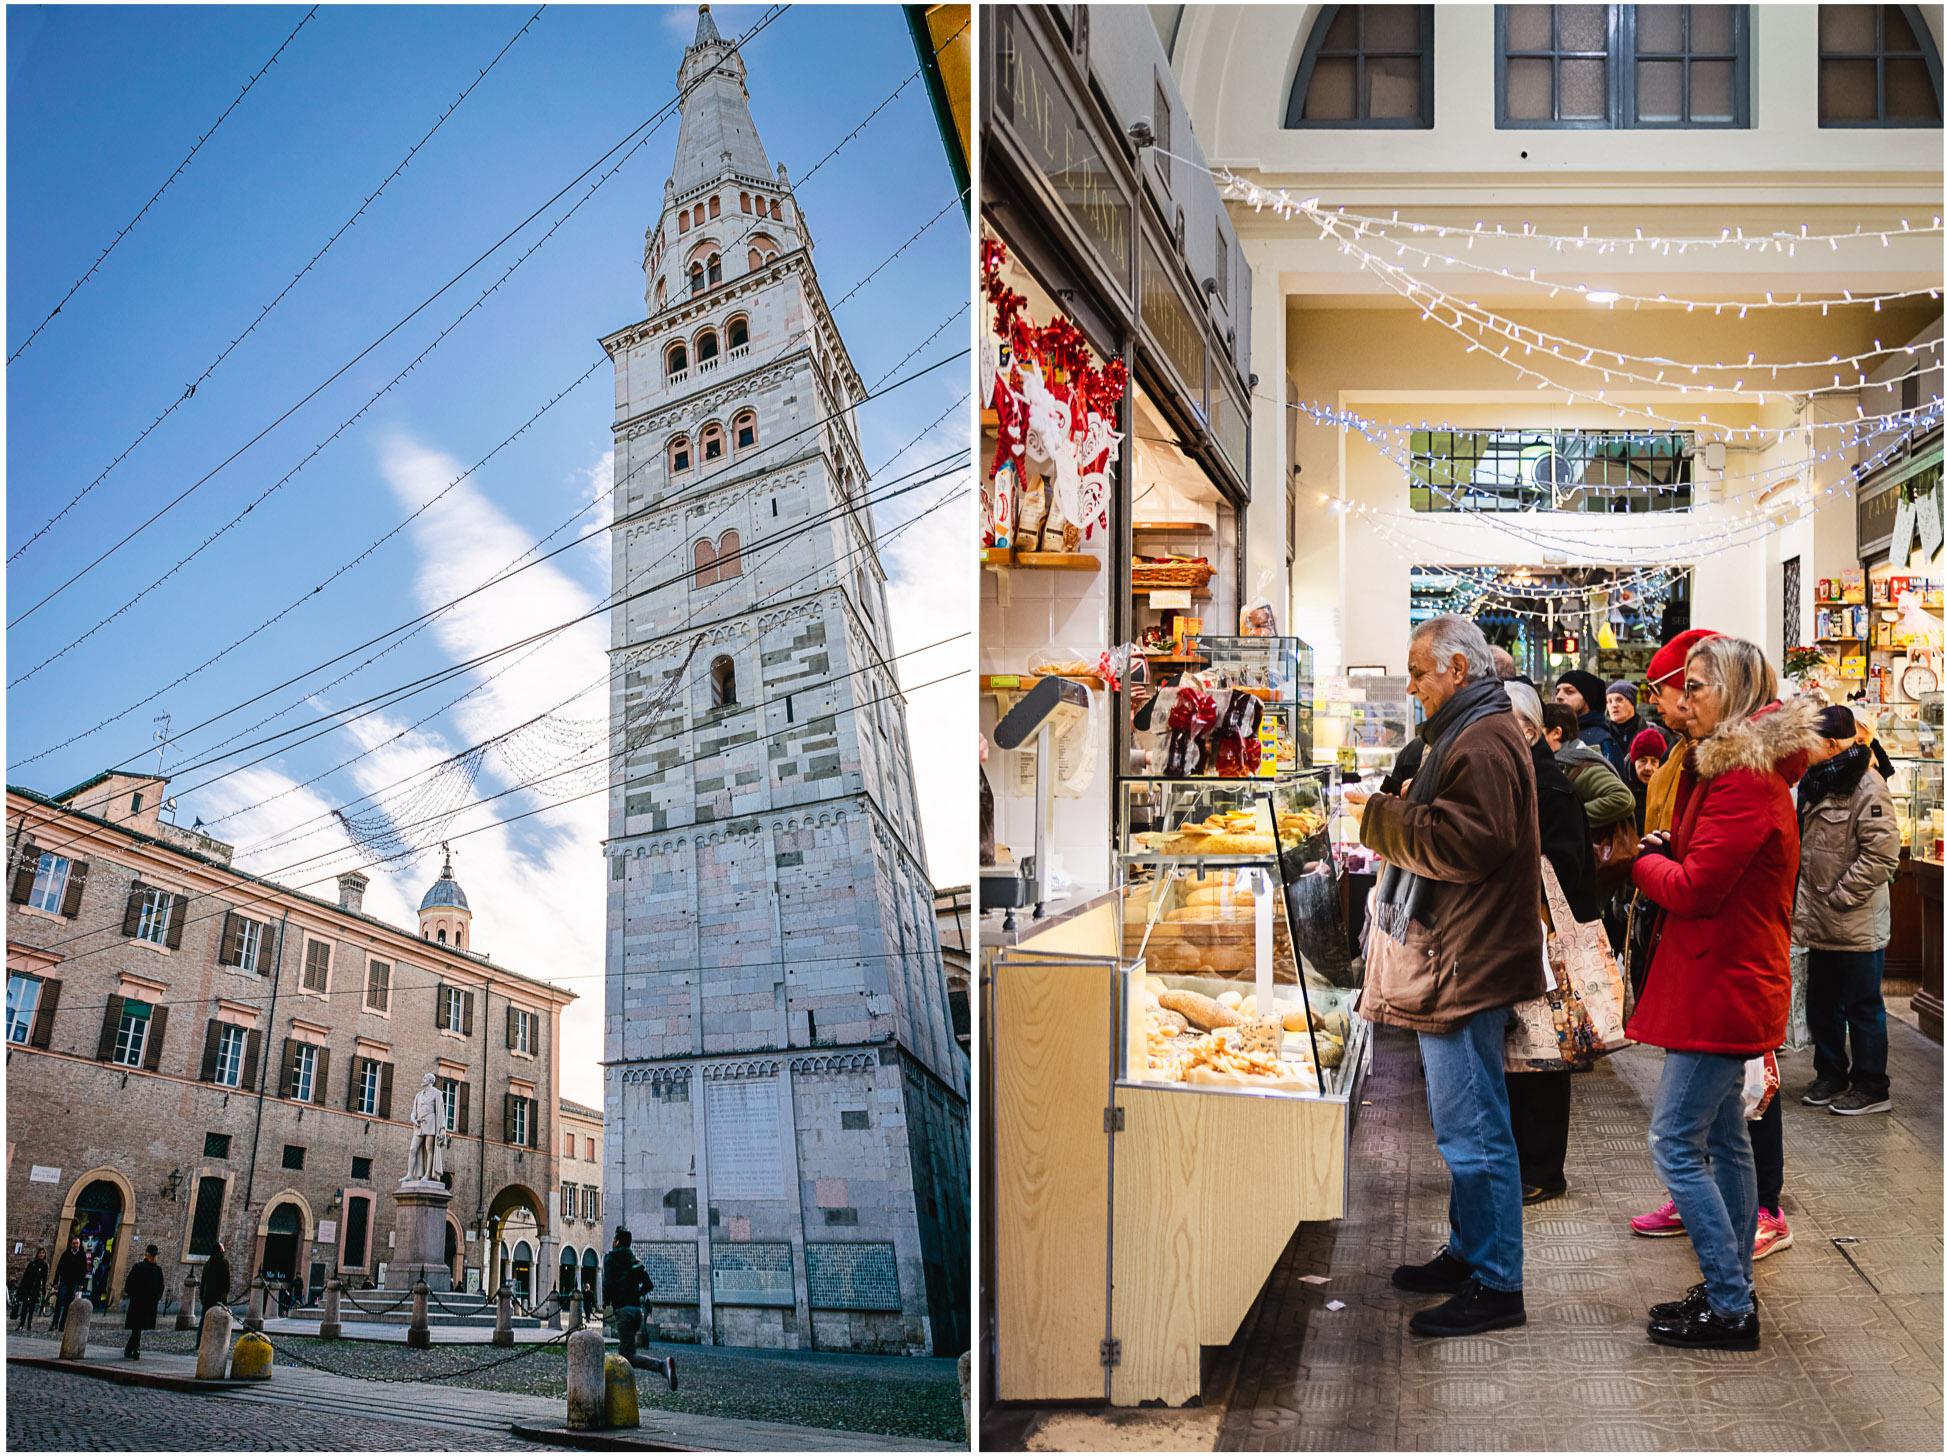 modena italien torre ghirlandina mercato albinelli